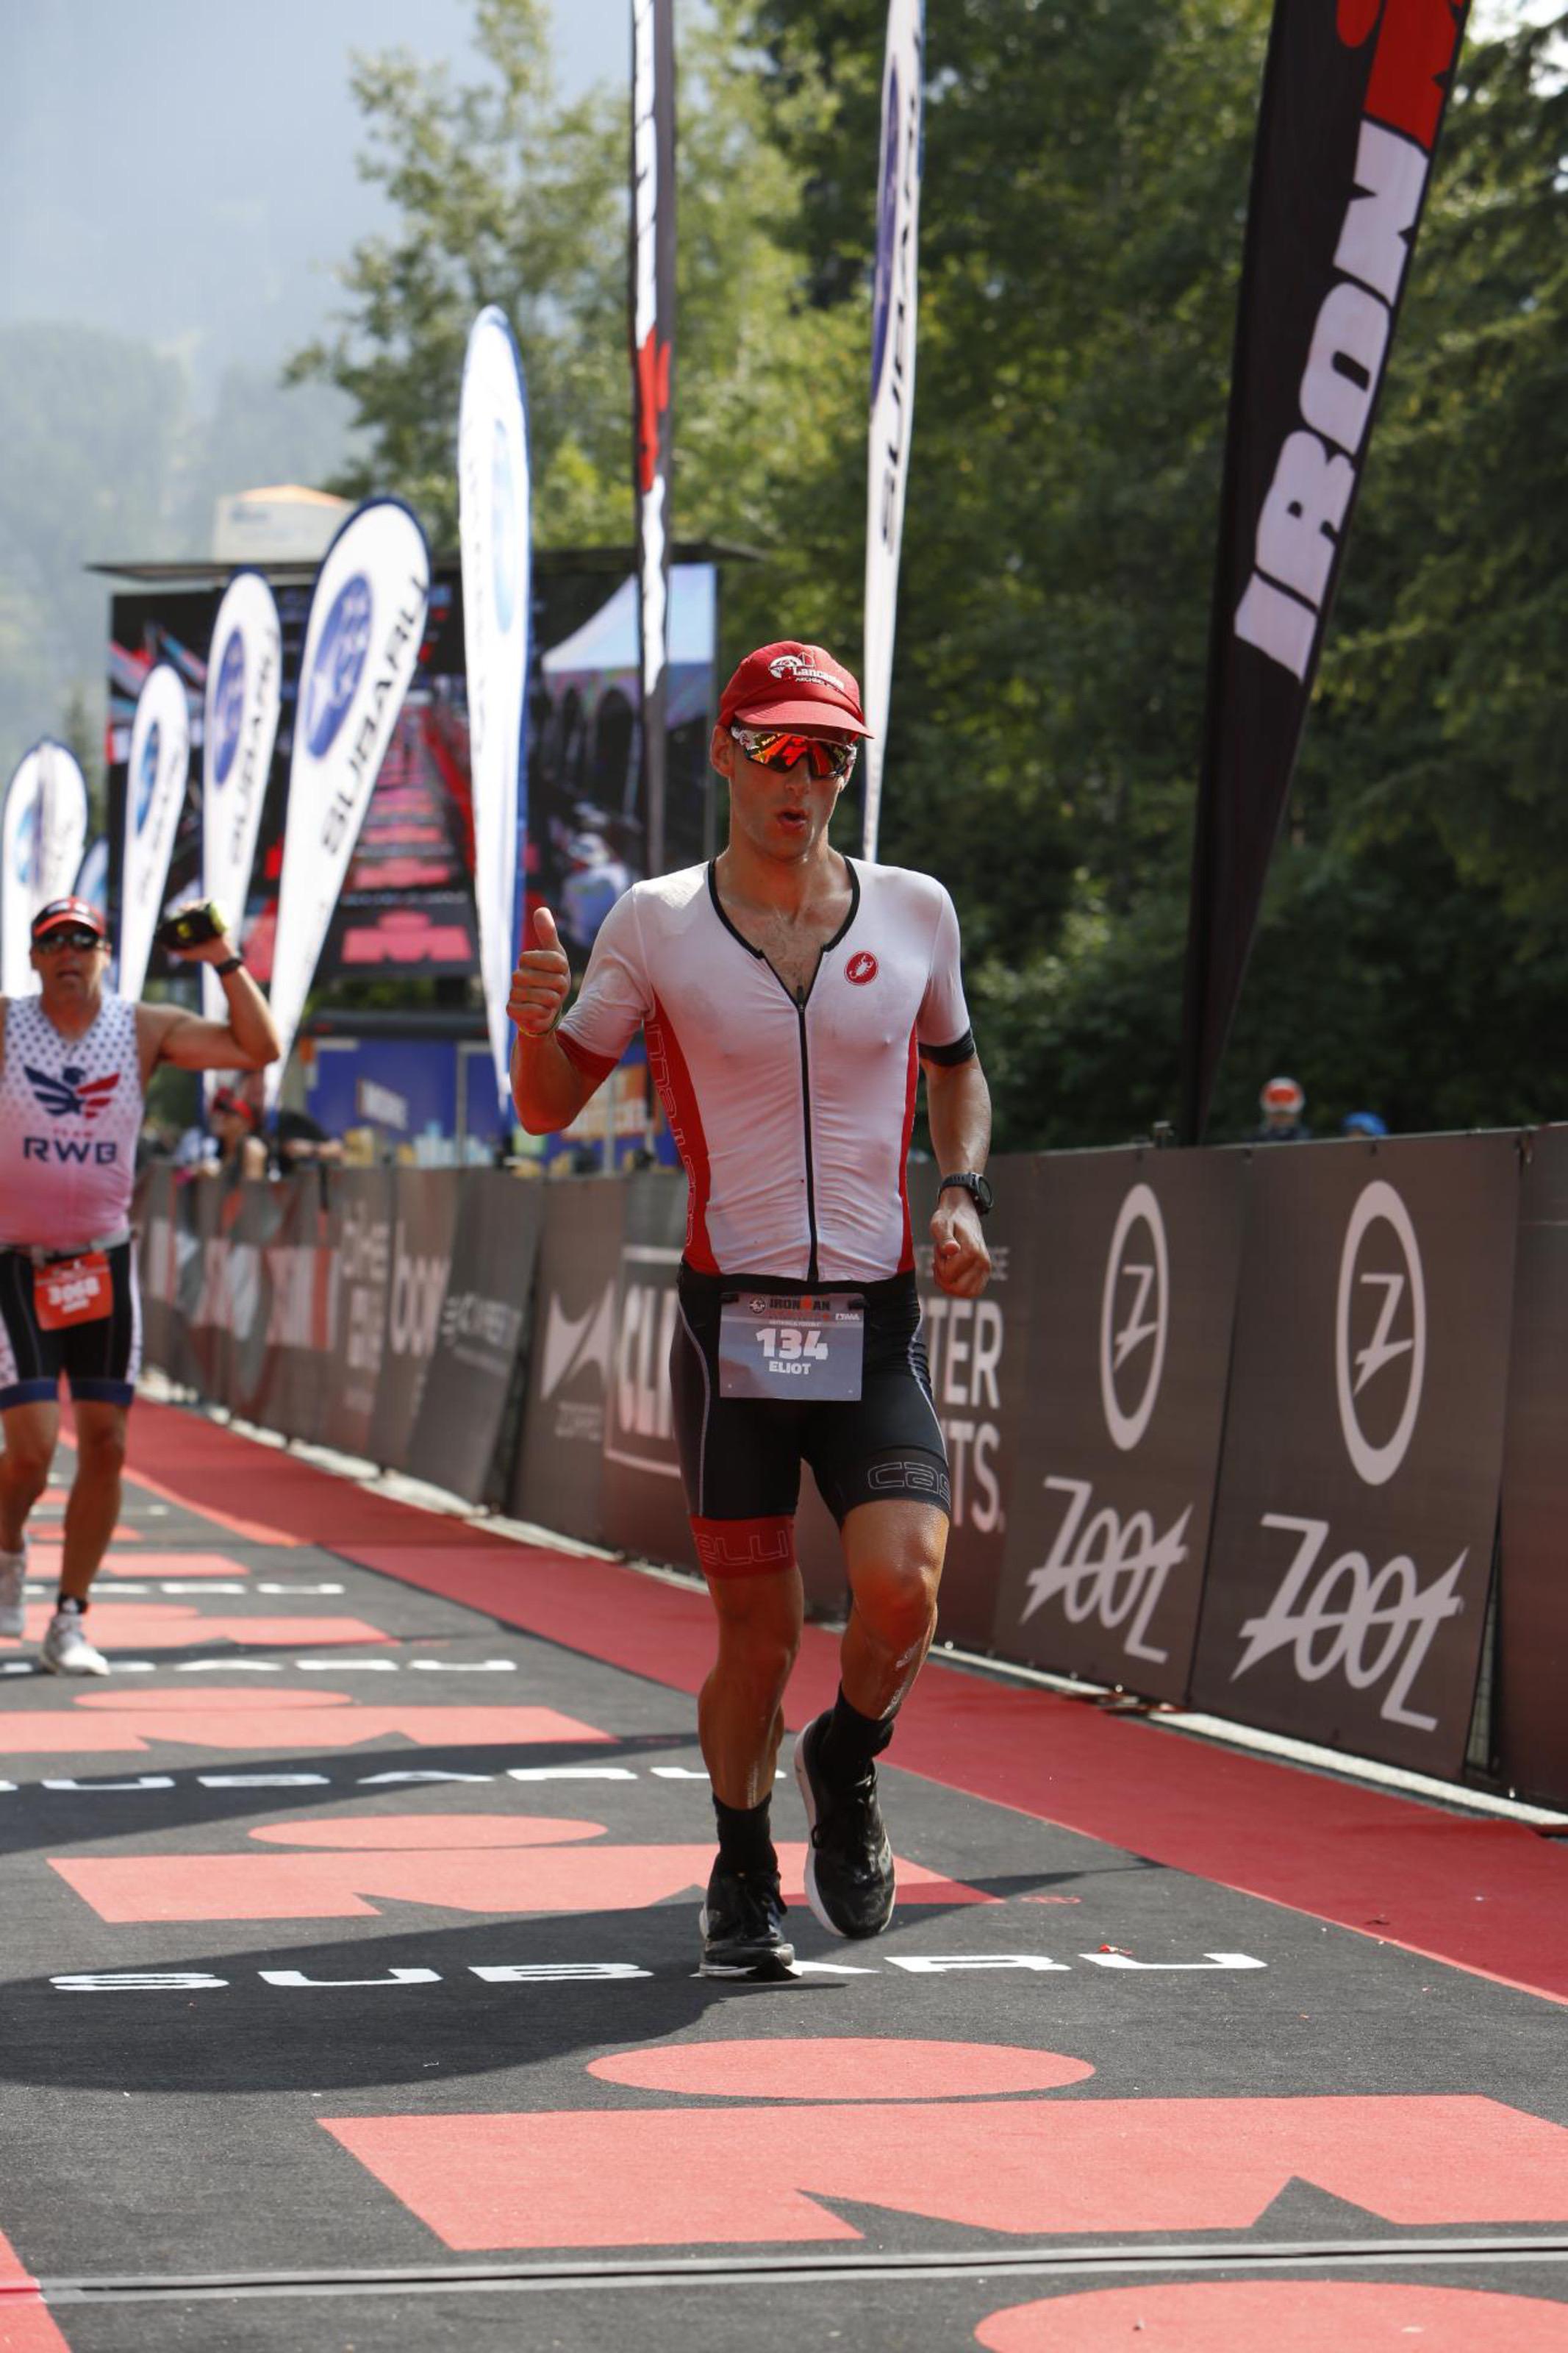 IRONMAN run training